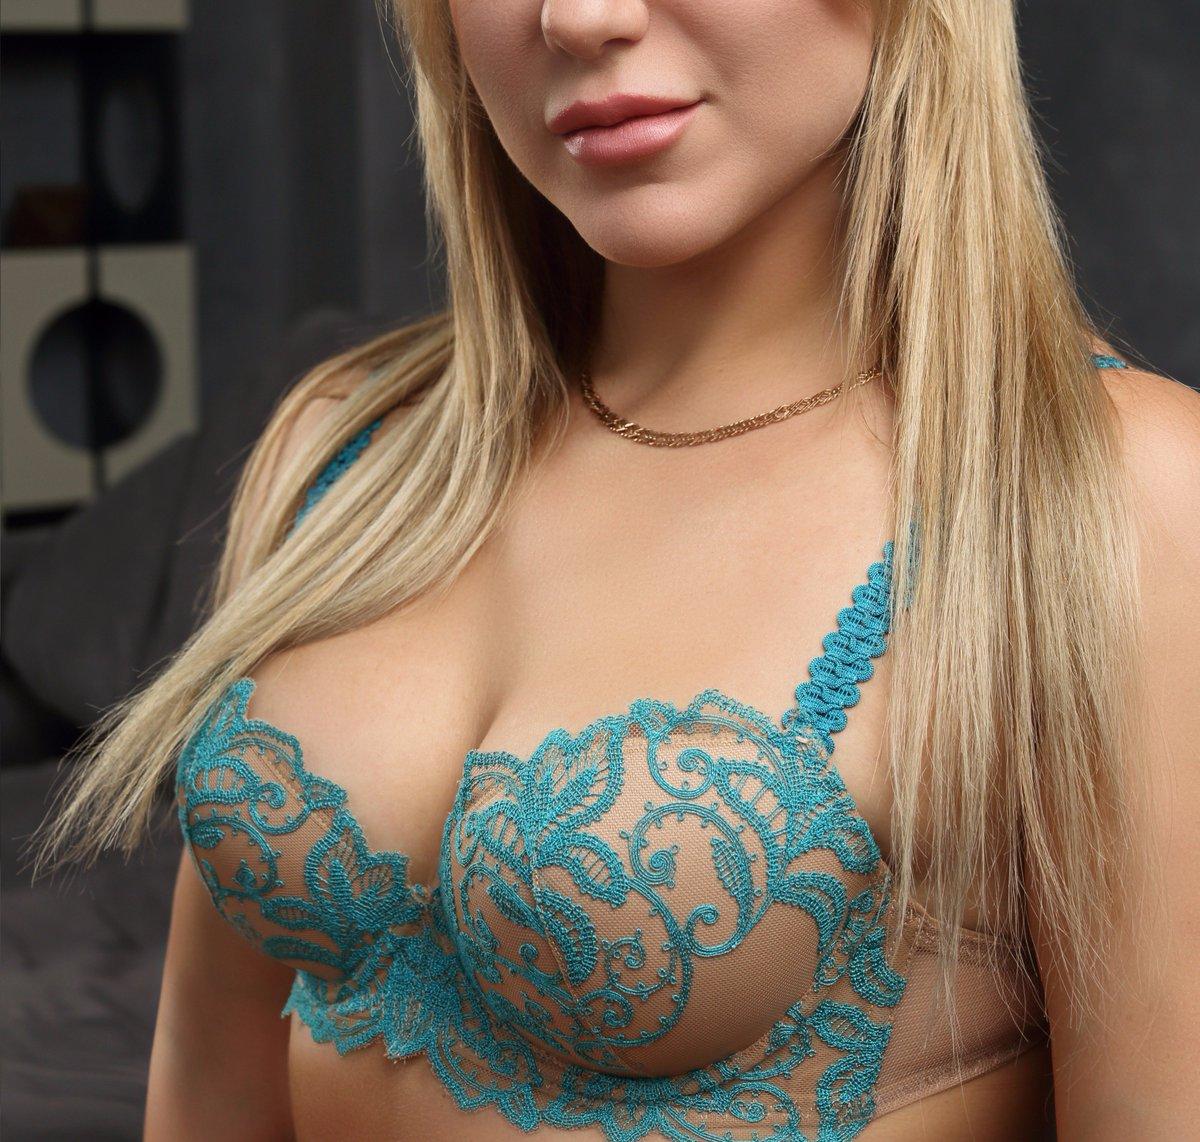 amazing big ass matures pictures